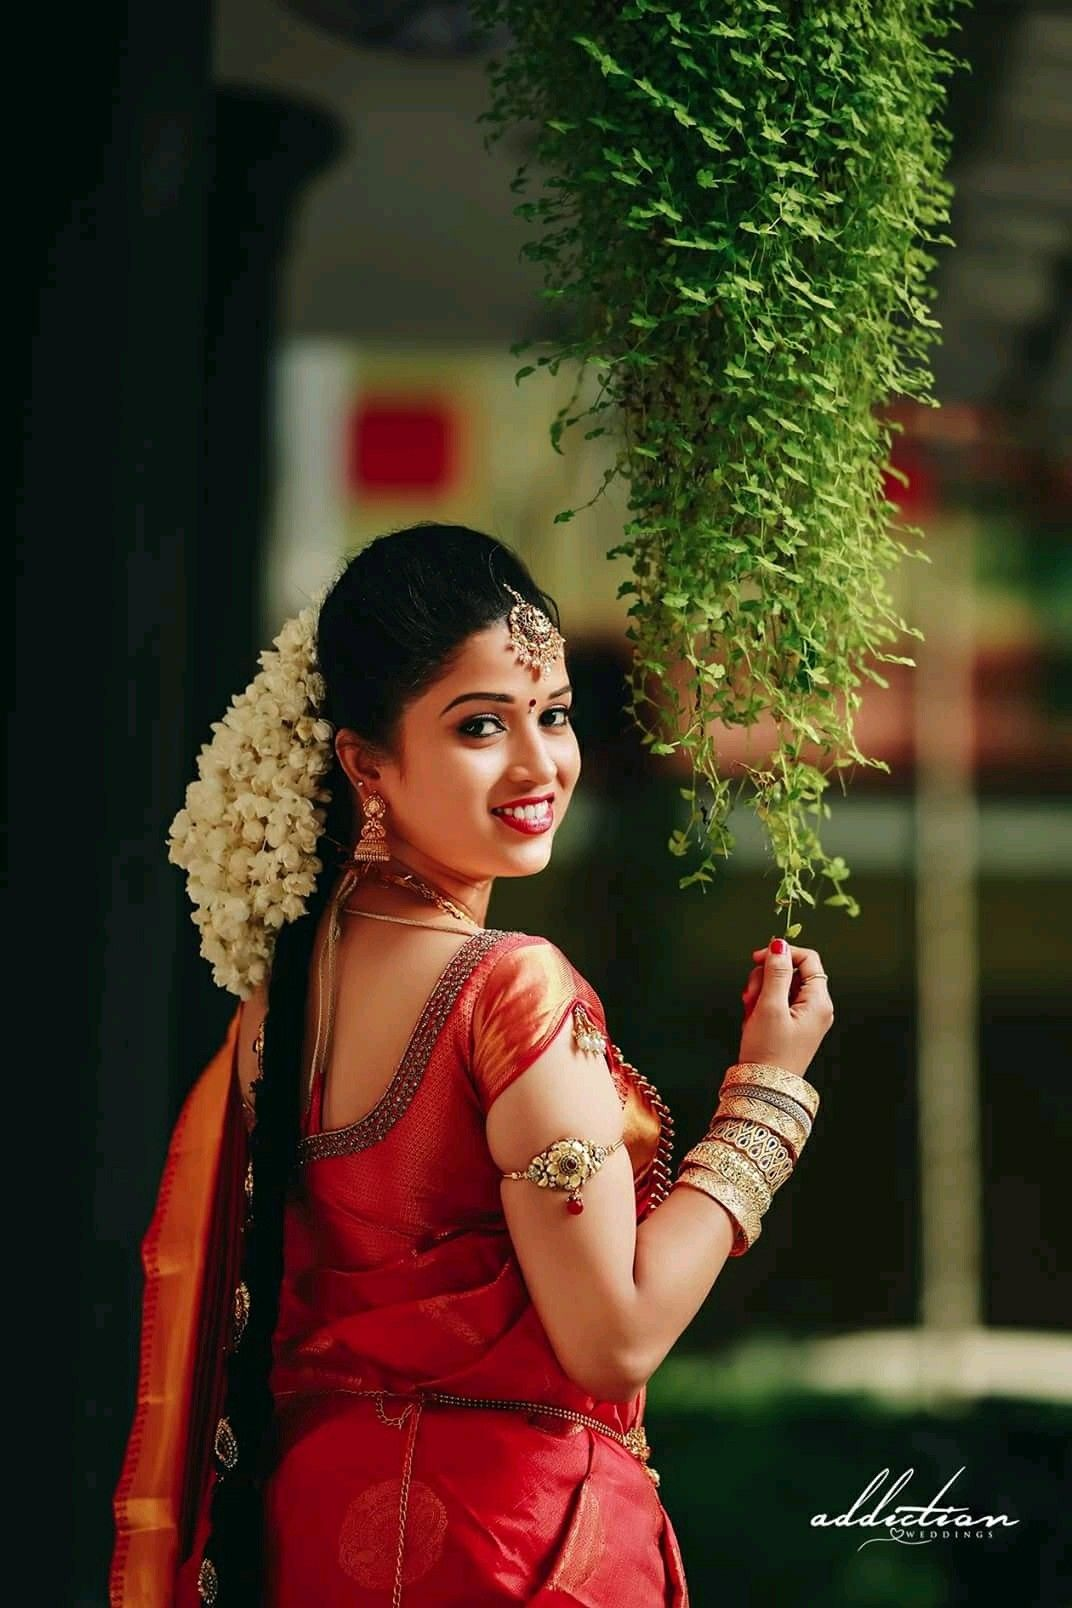 pin by ashok kumar on best makeup in 2019 | kerala wedding